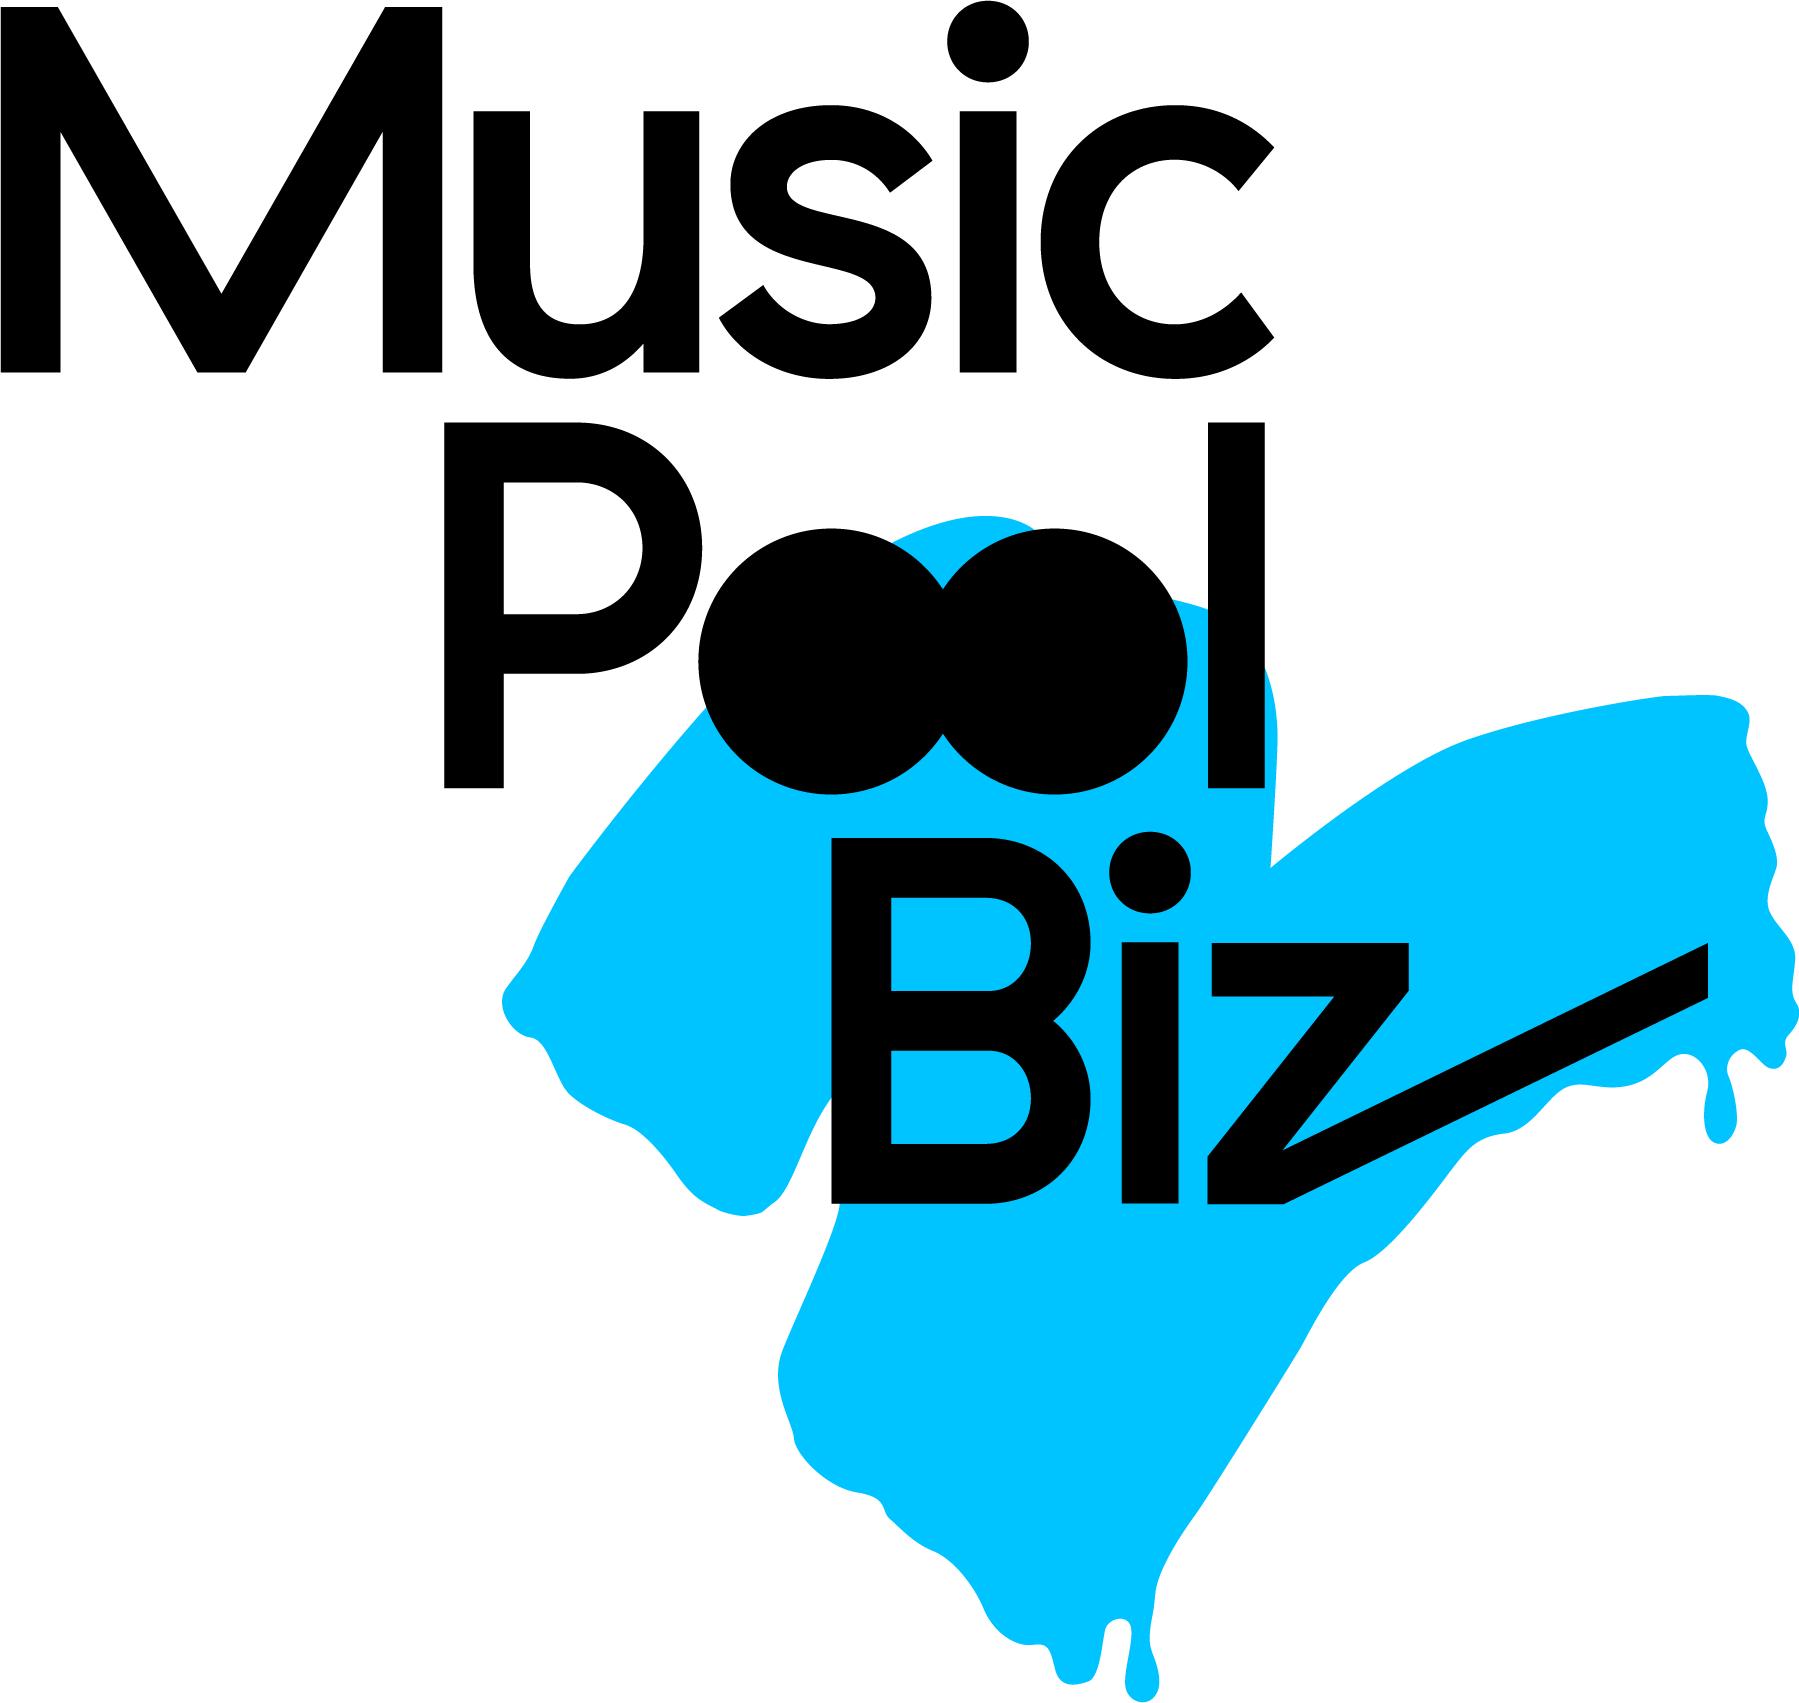 Music Pool Biz